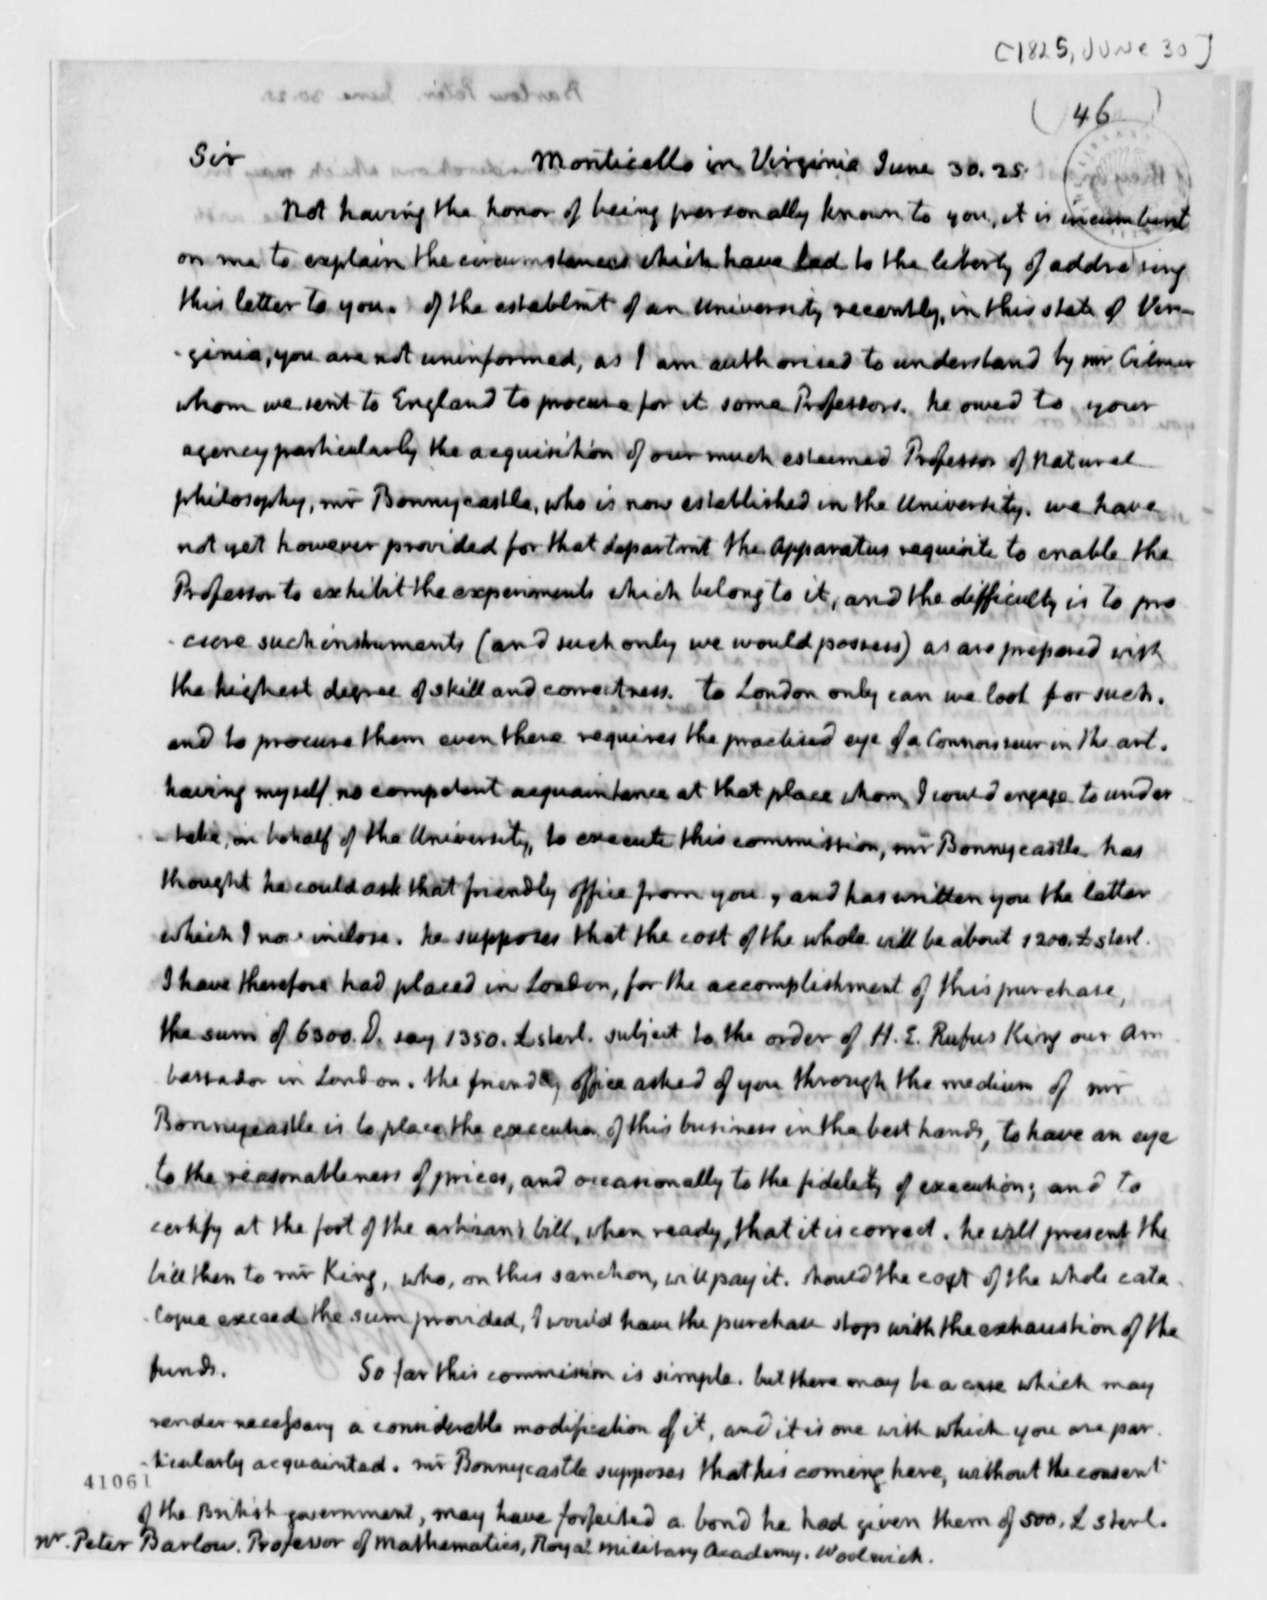 Thomas Jefferson to Peter Barlow, June 30, 1825